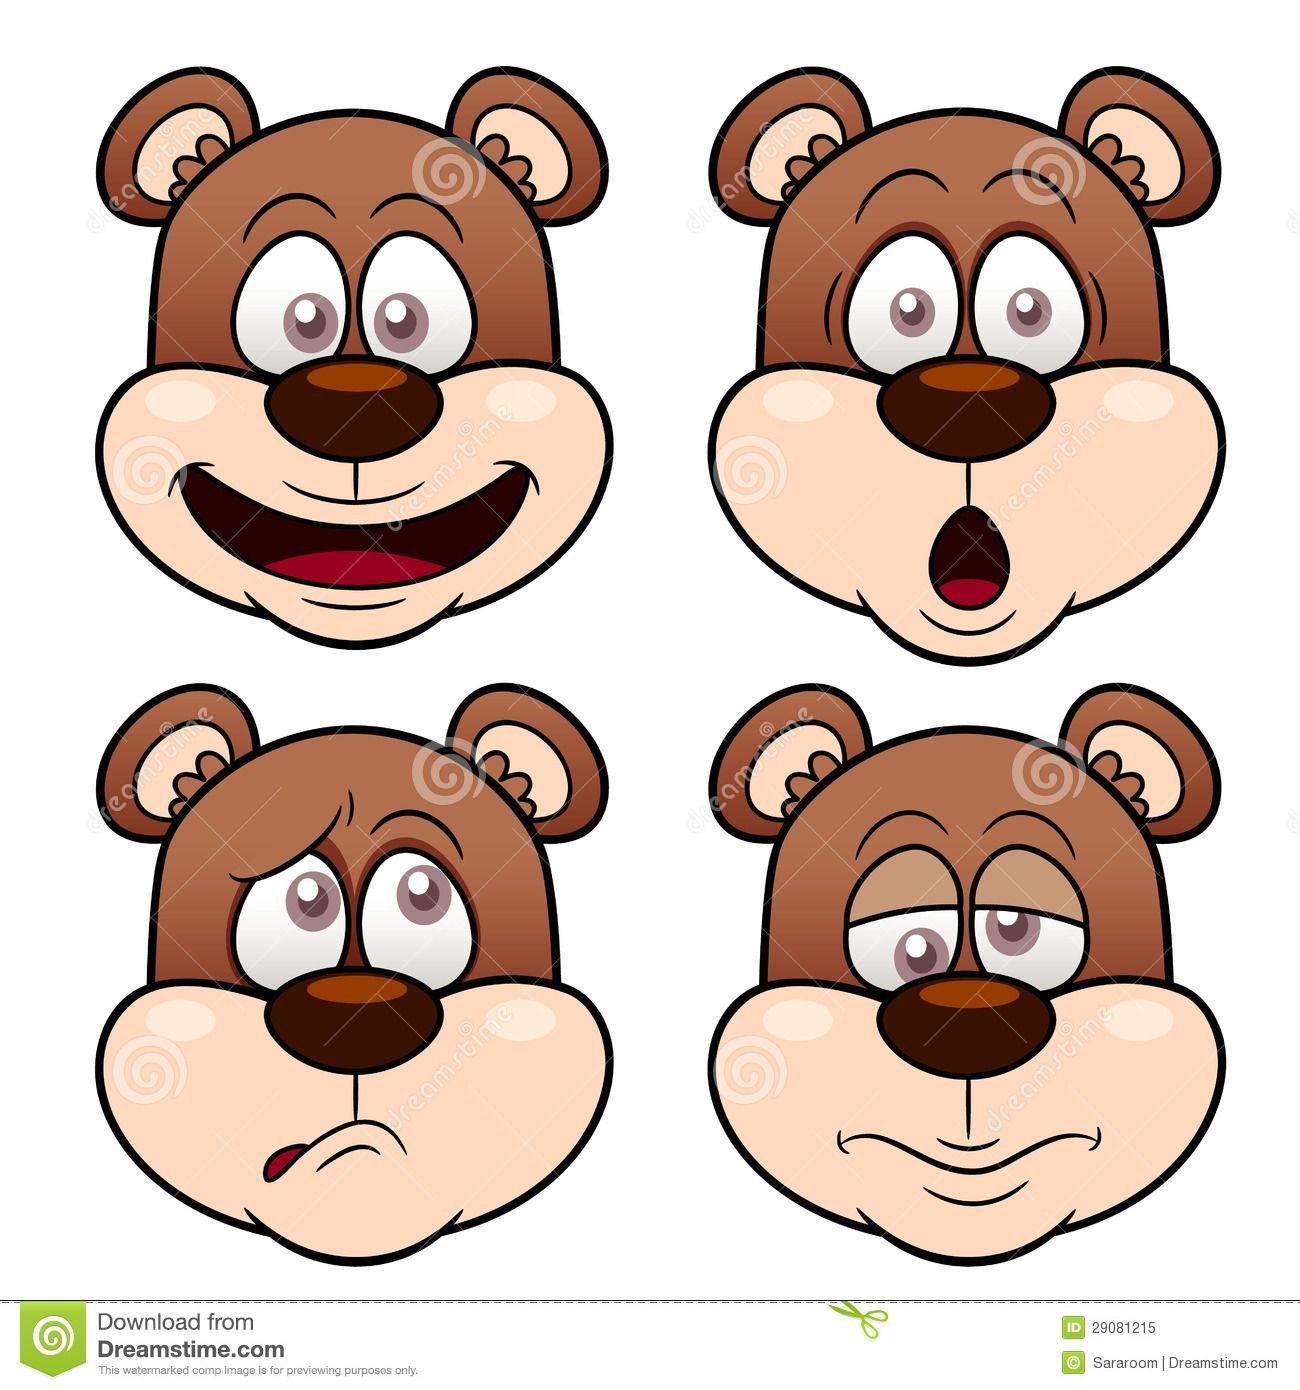 Smile. Vector illustration   Bear face drawing, Bear face ... (1300 x 1390 Pixel)